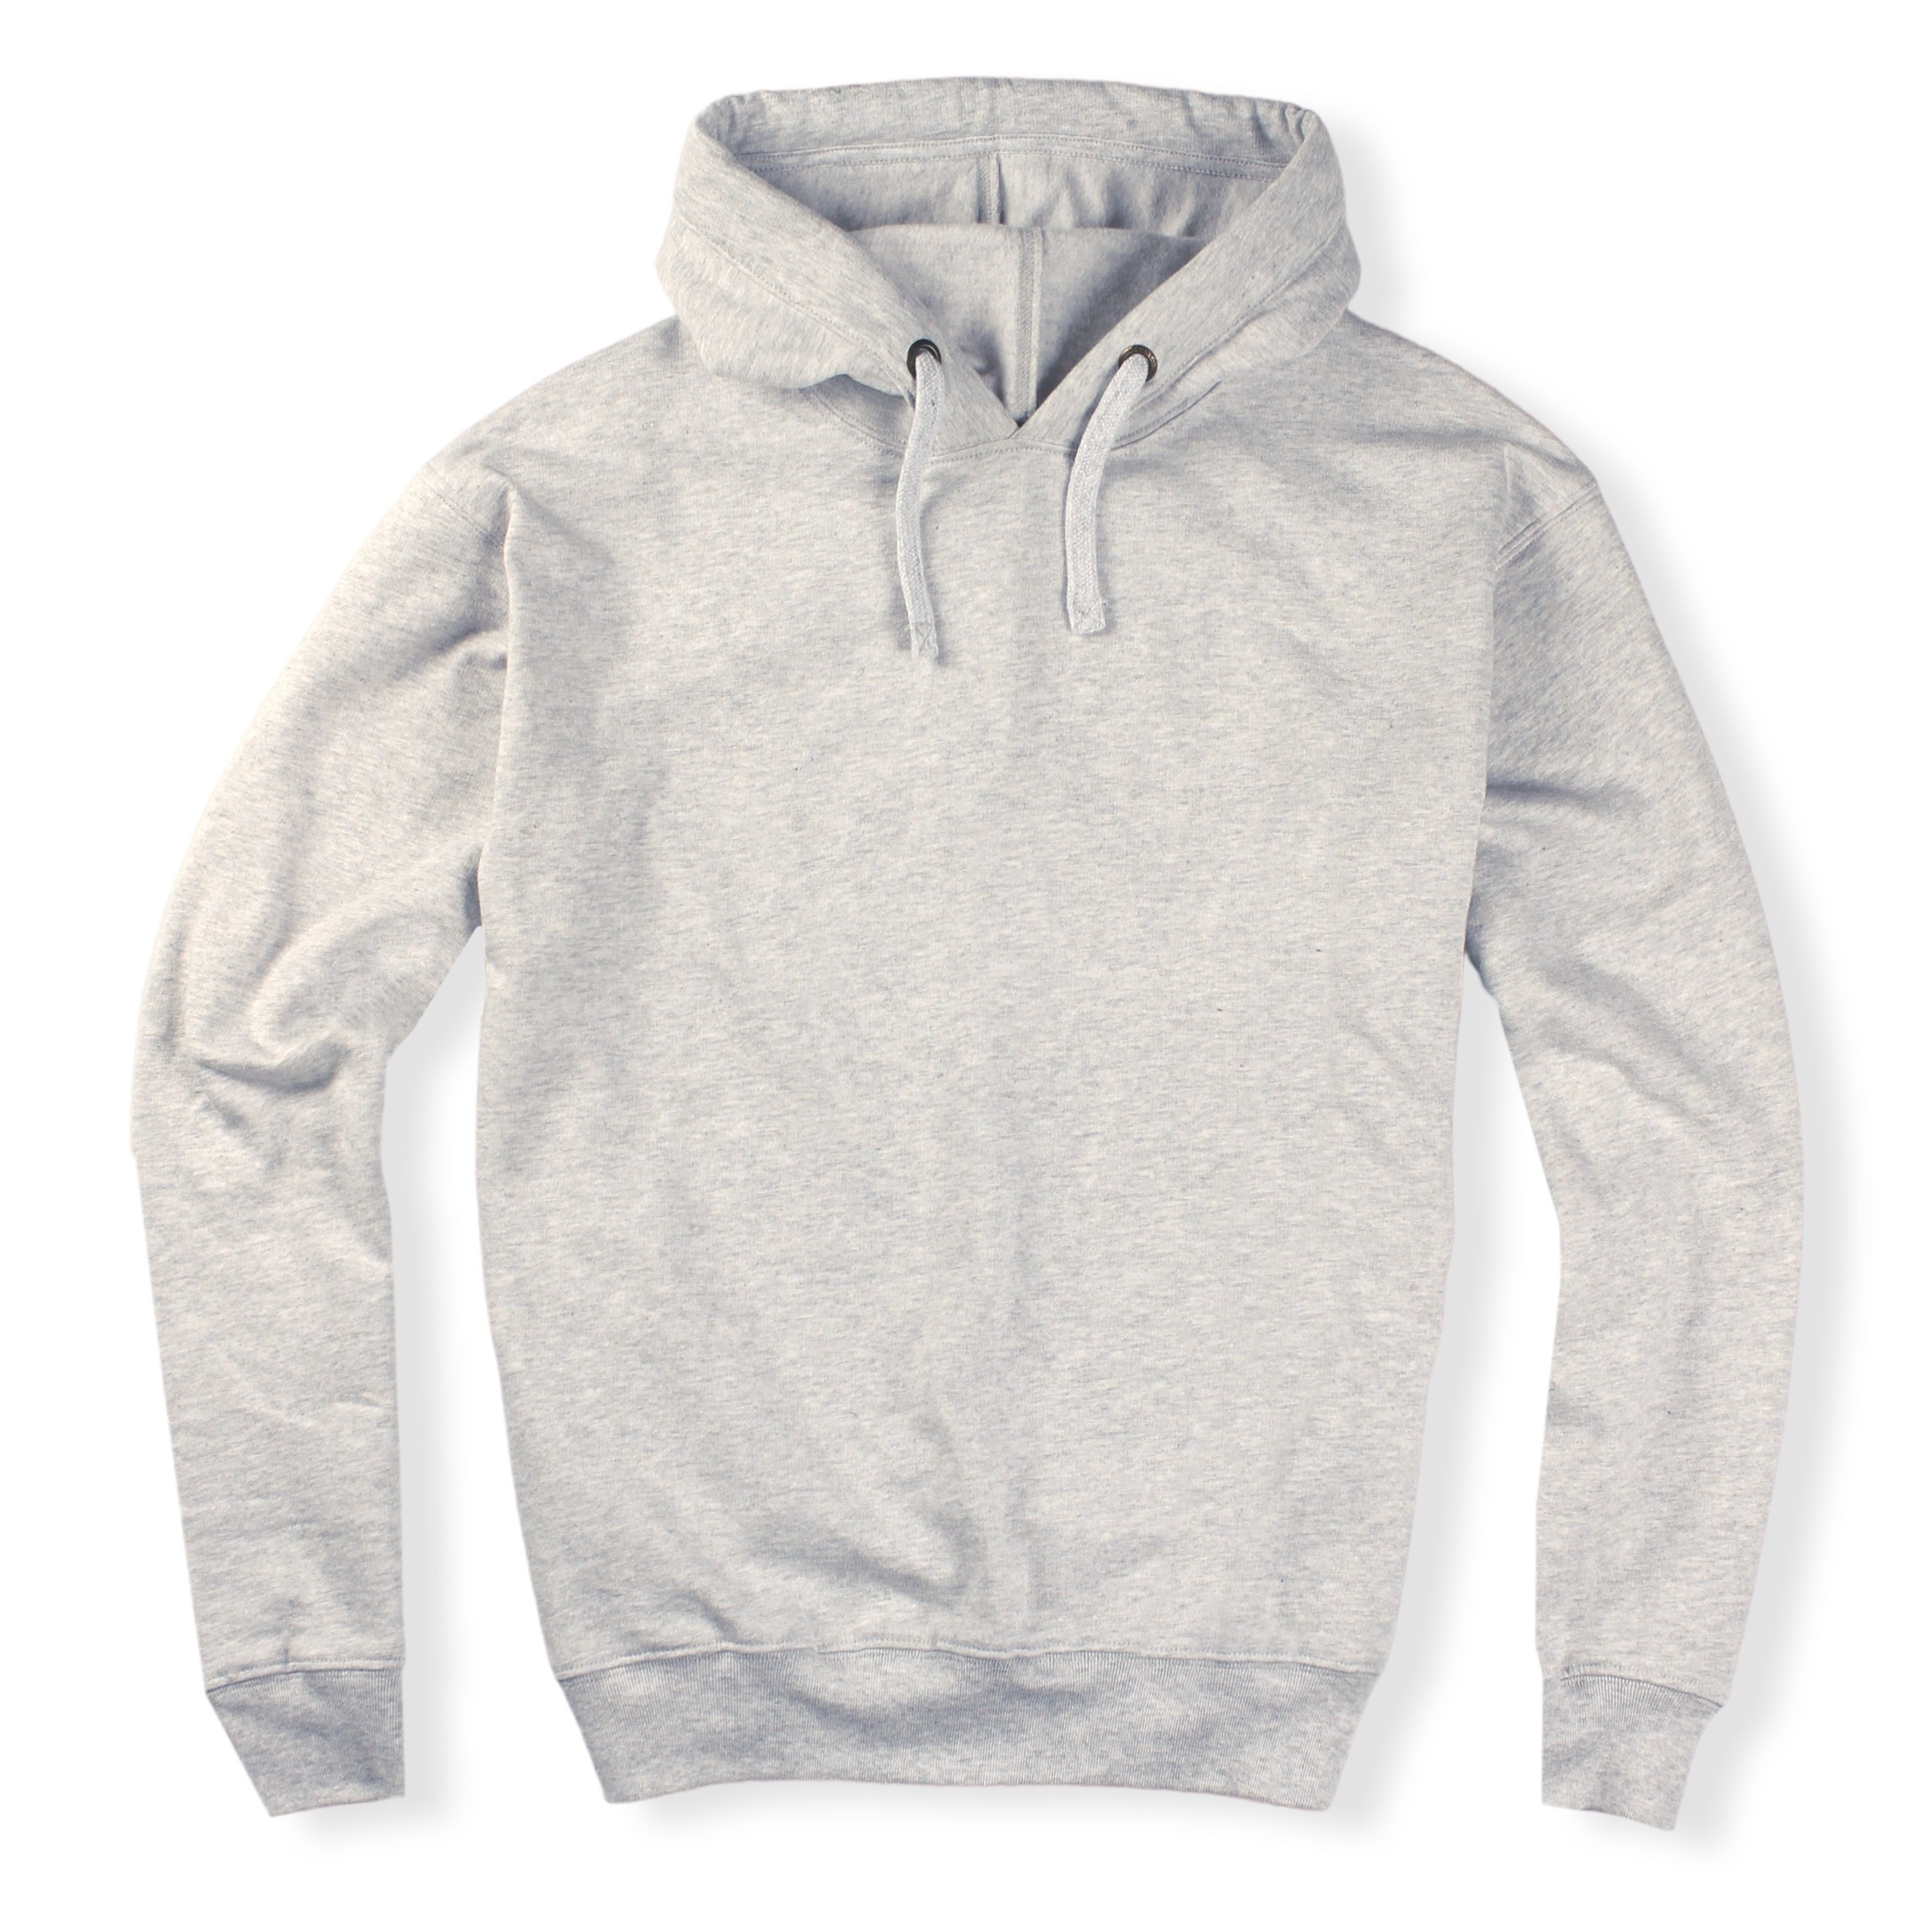 Training sweatshirt